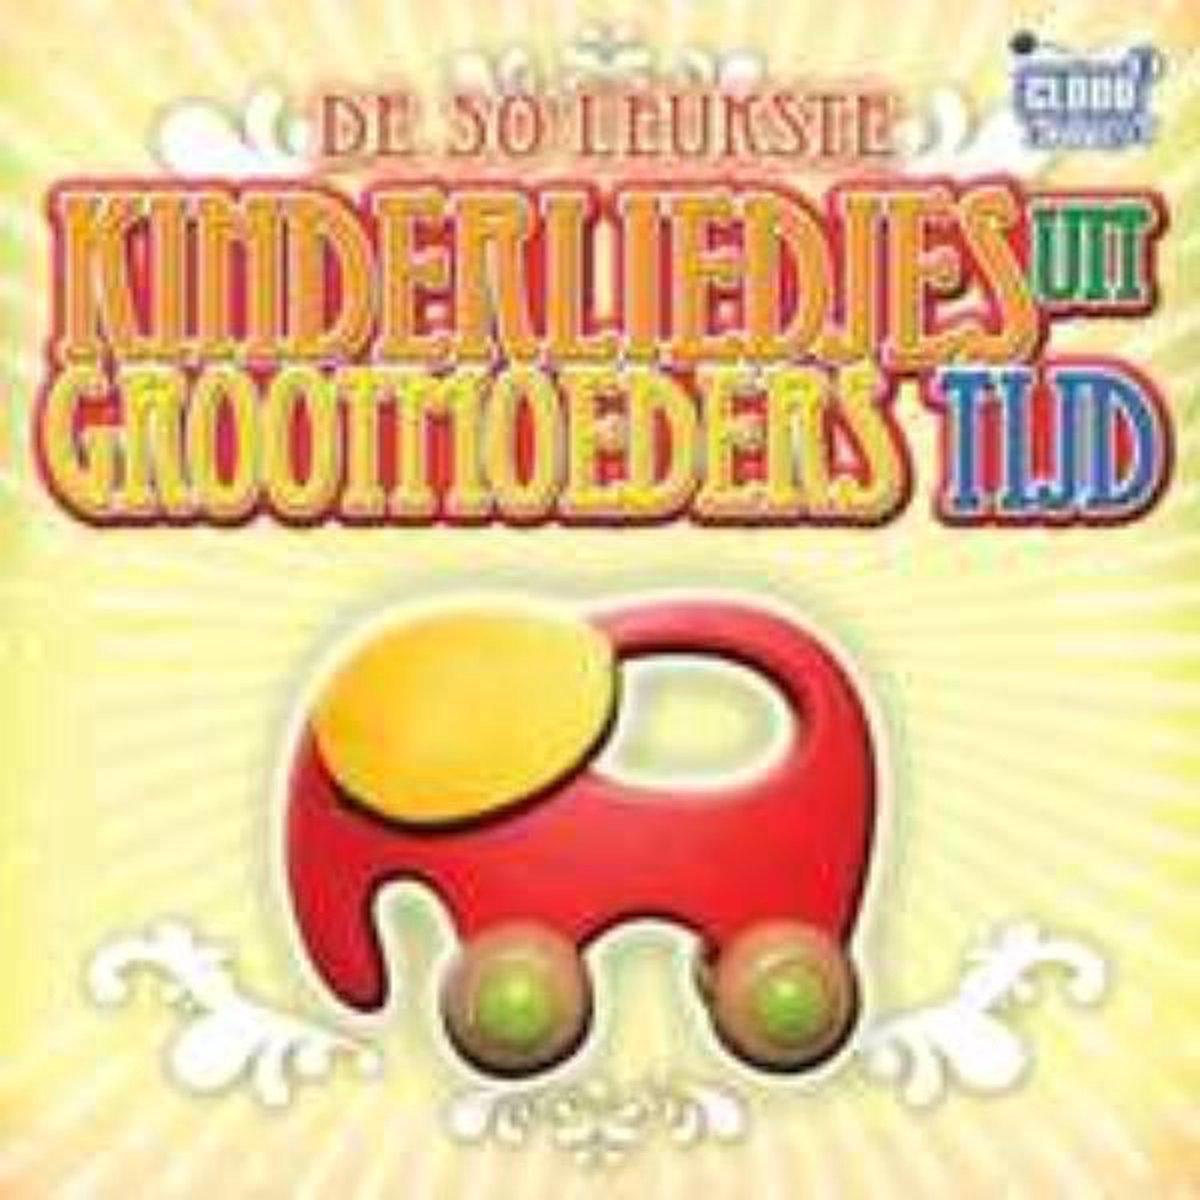 50 Leukste Kinderliedjes Uit Grootmoeders Tijd - various artists